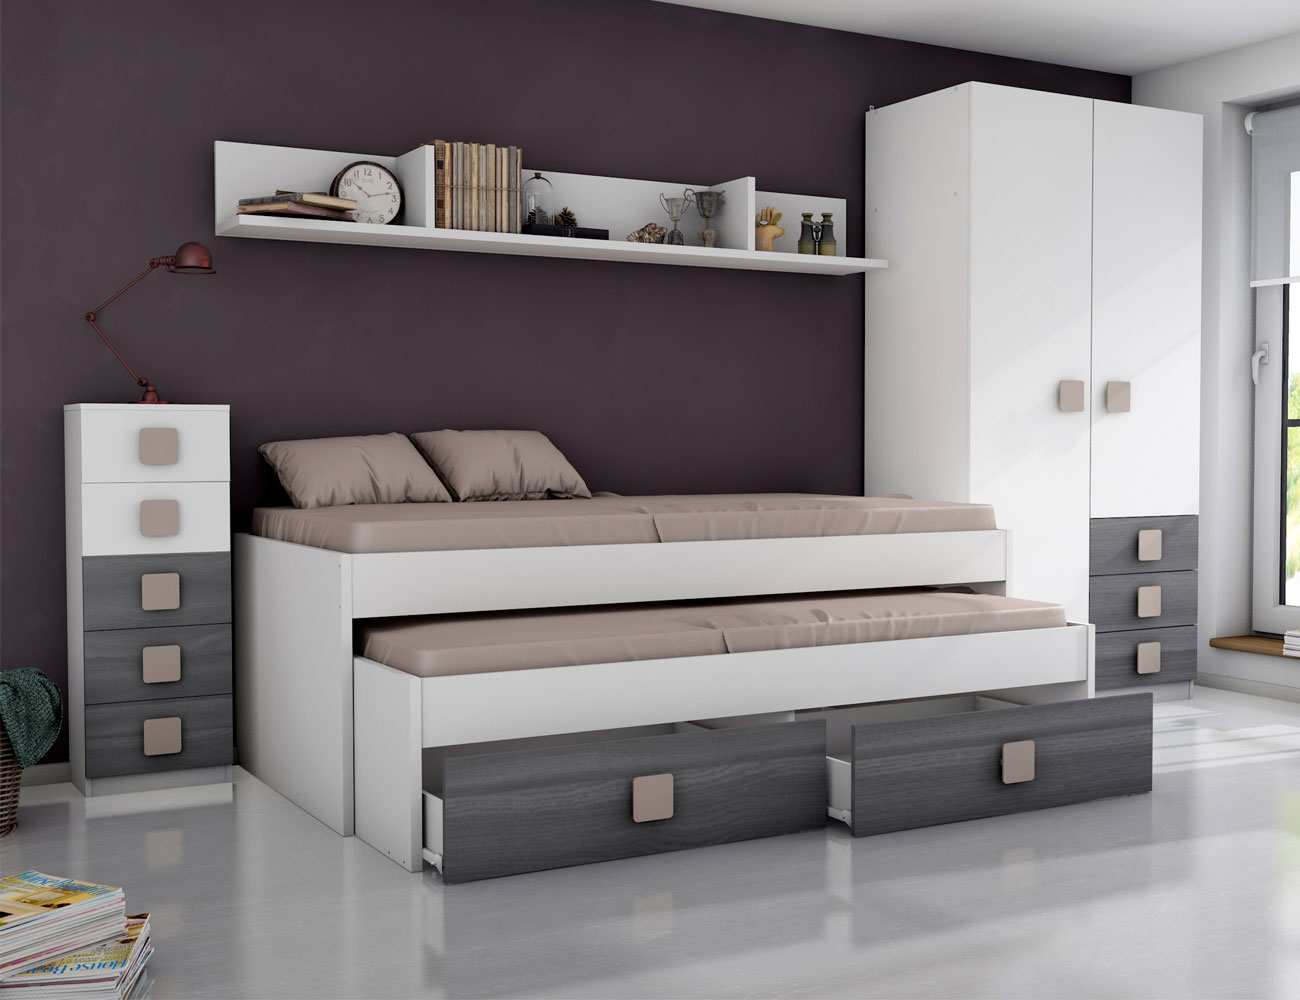 Dormitorio juvenil ceniza moka6